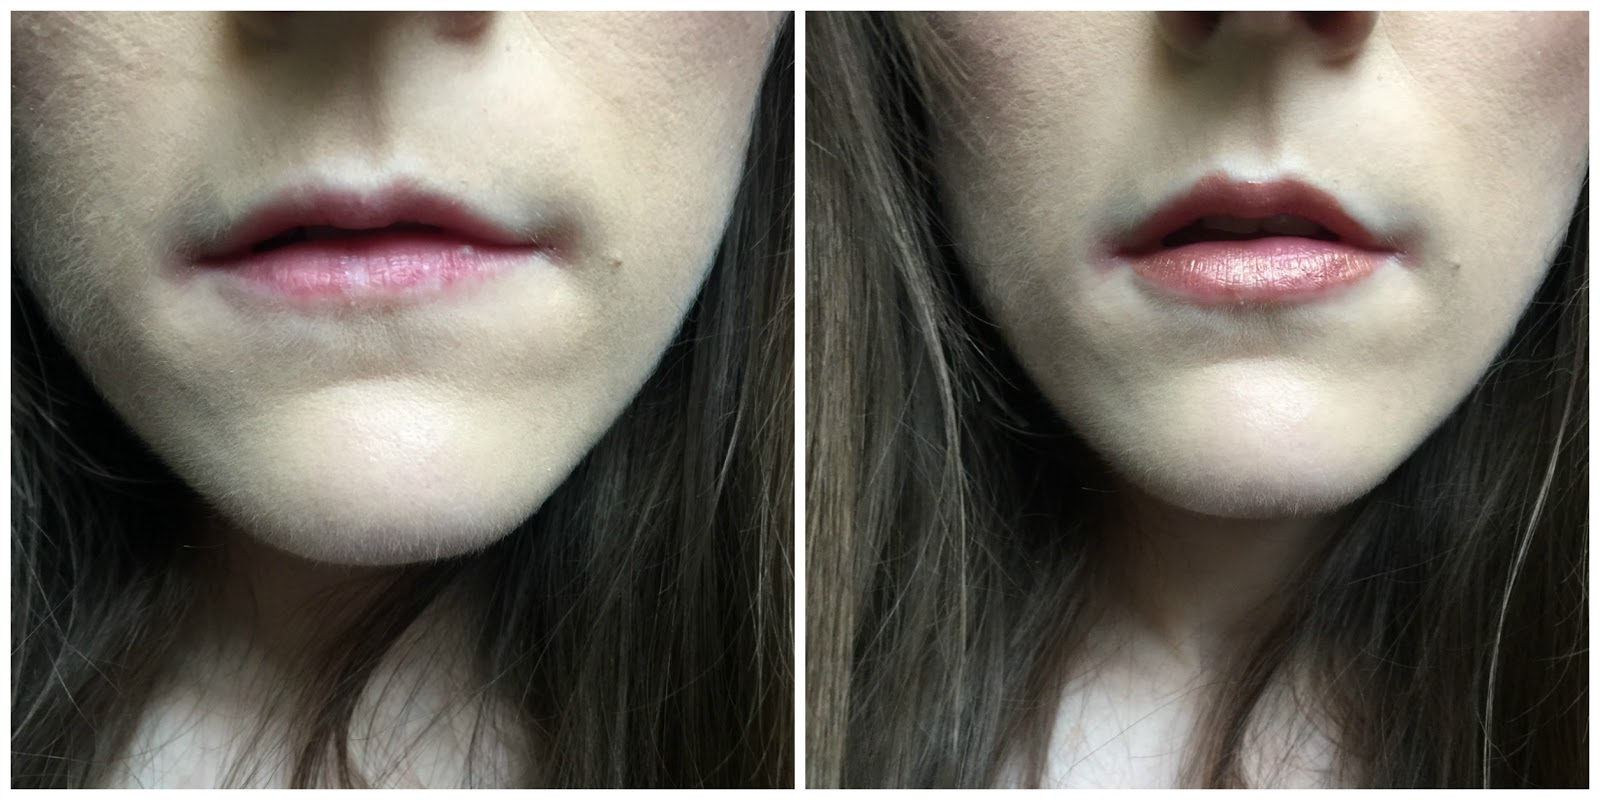 sleek distorted dreams matte me metallic lip creams roman copper